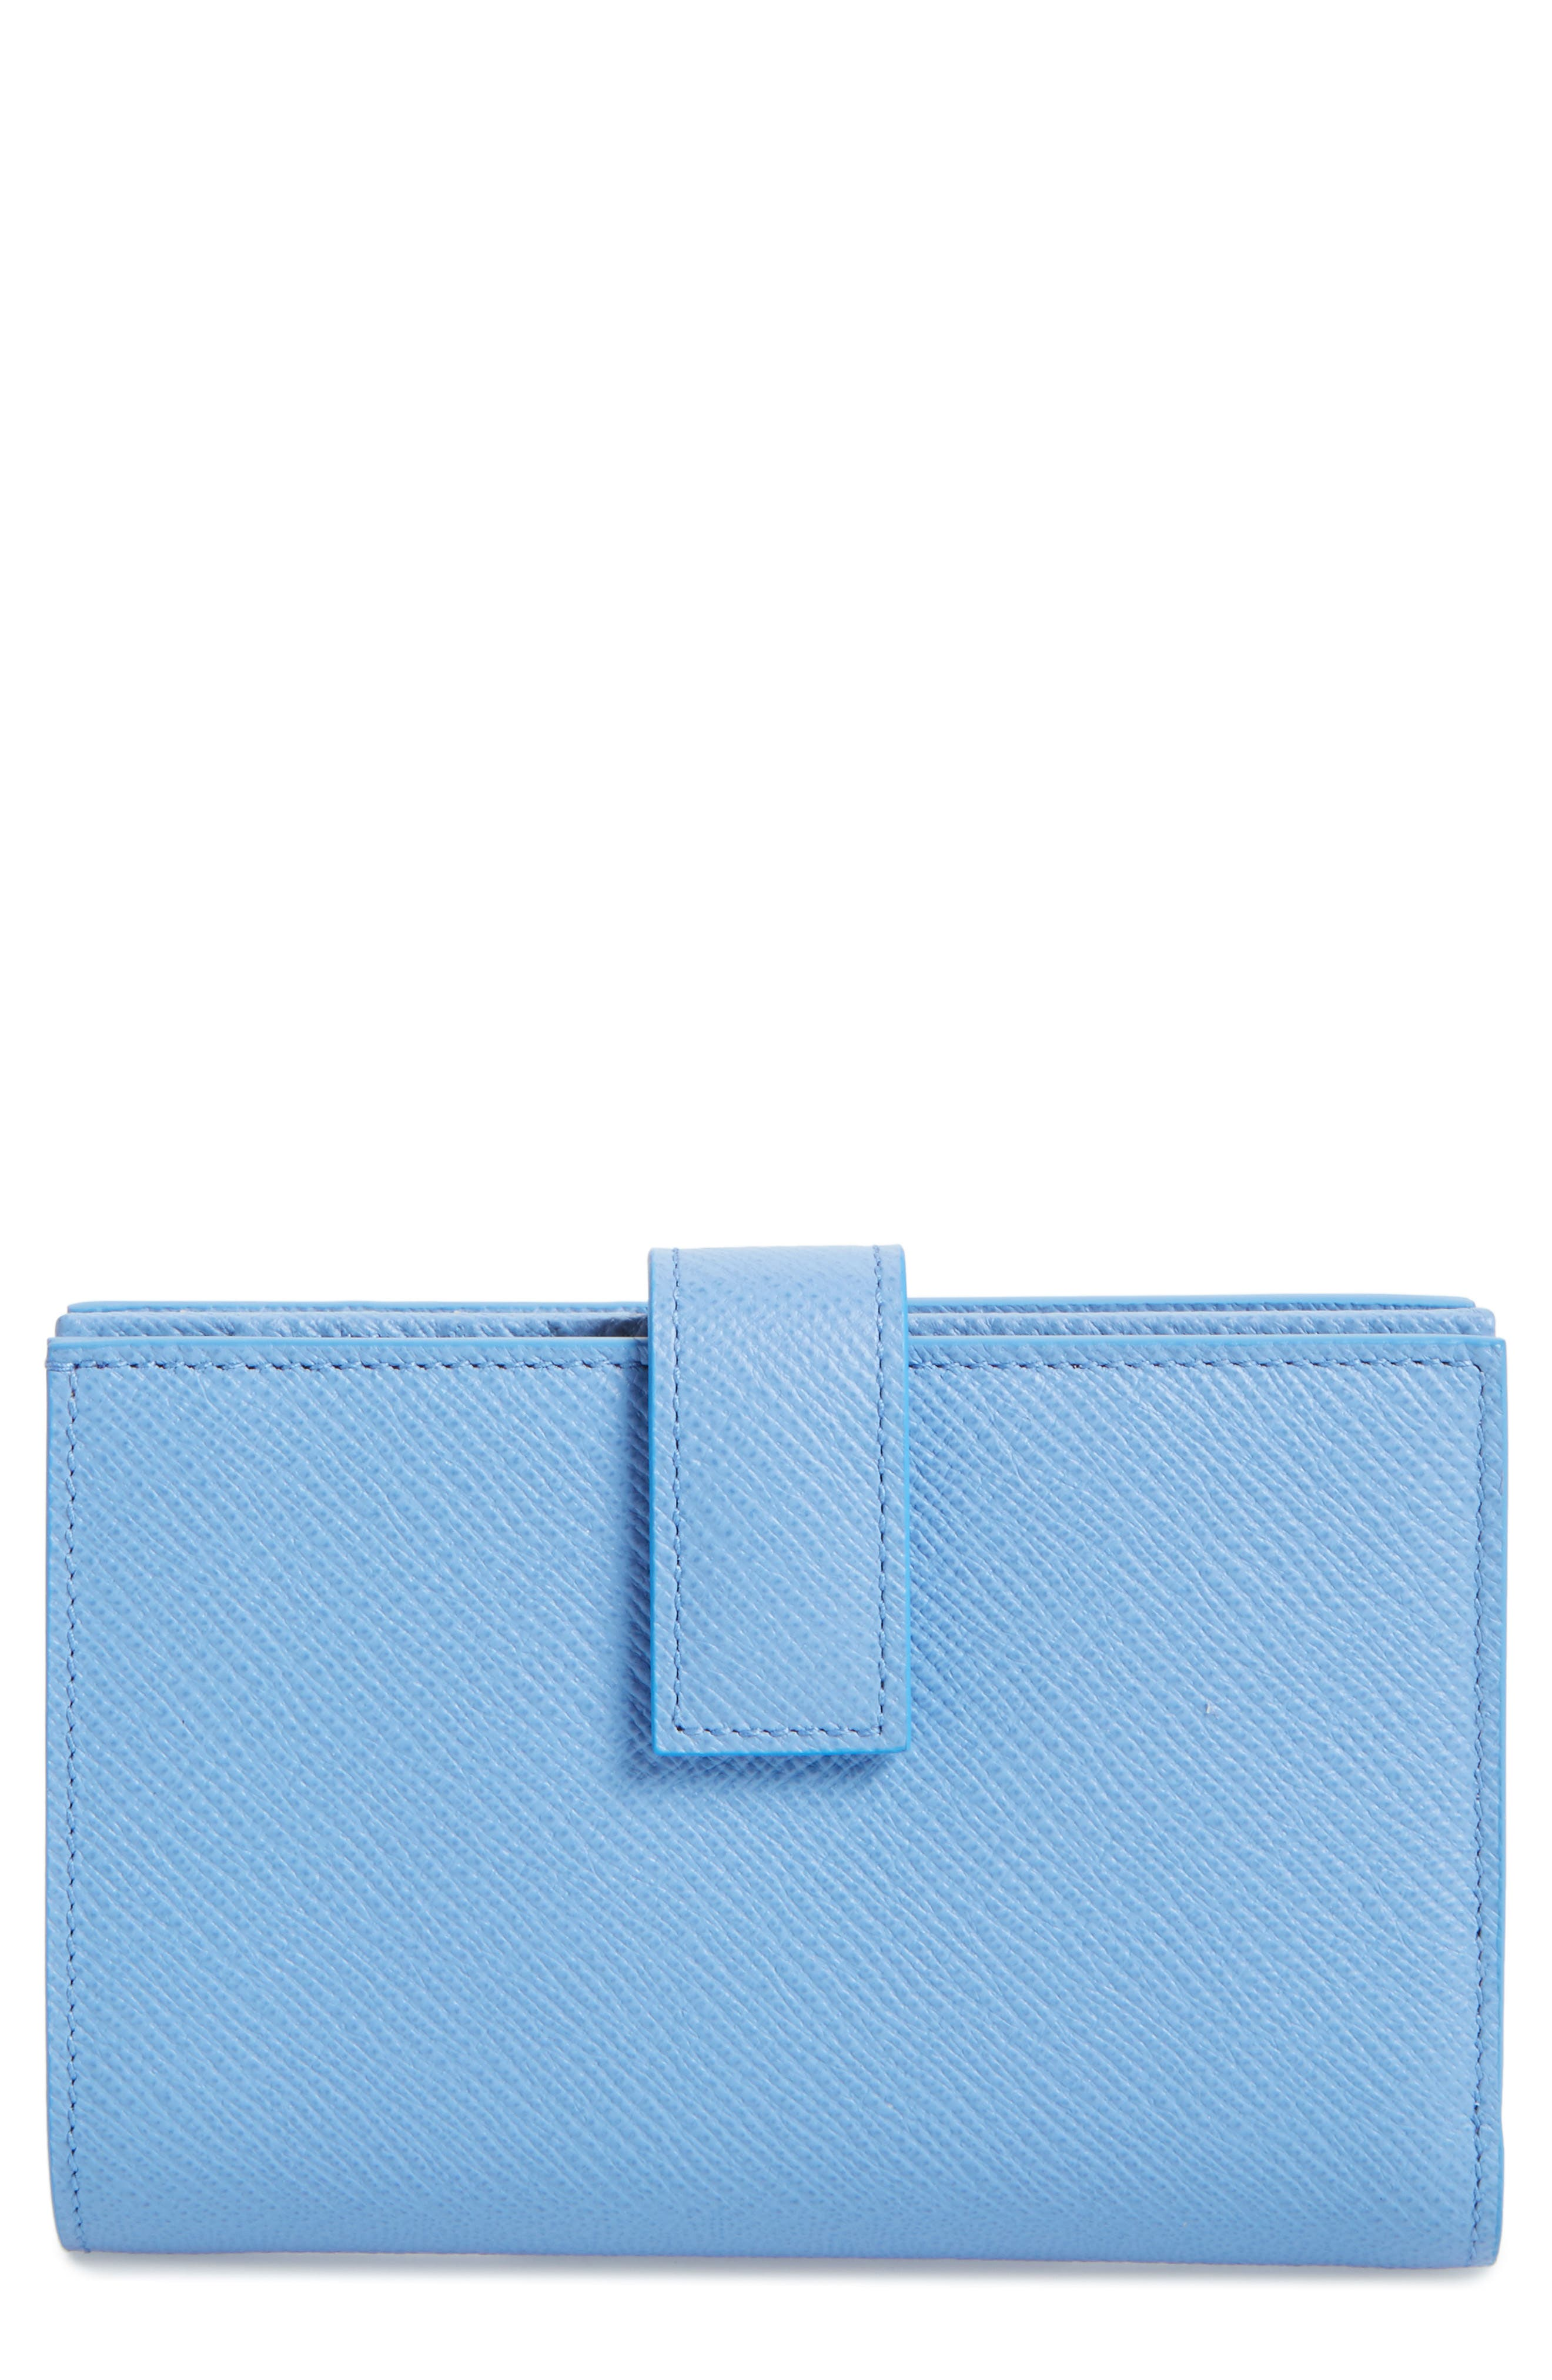 Main Image - Smythson 'Medium' Continental Wallet